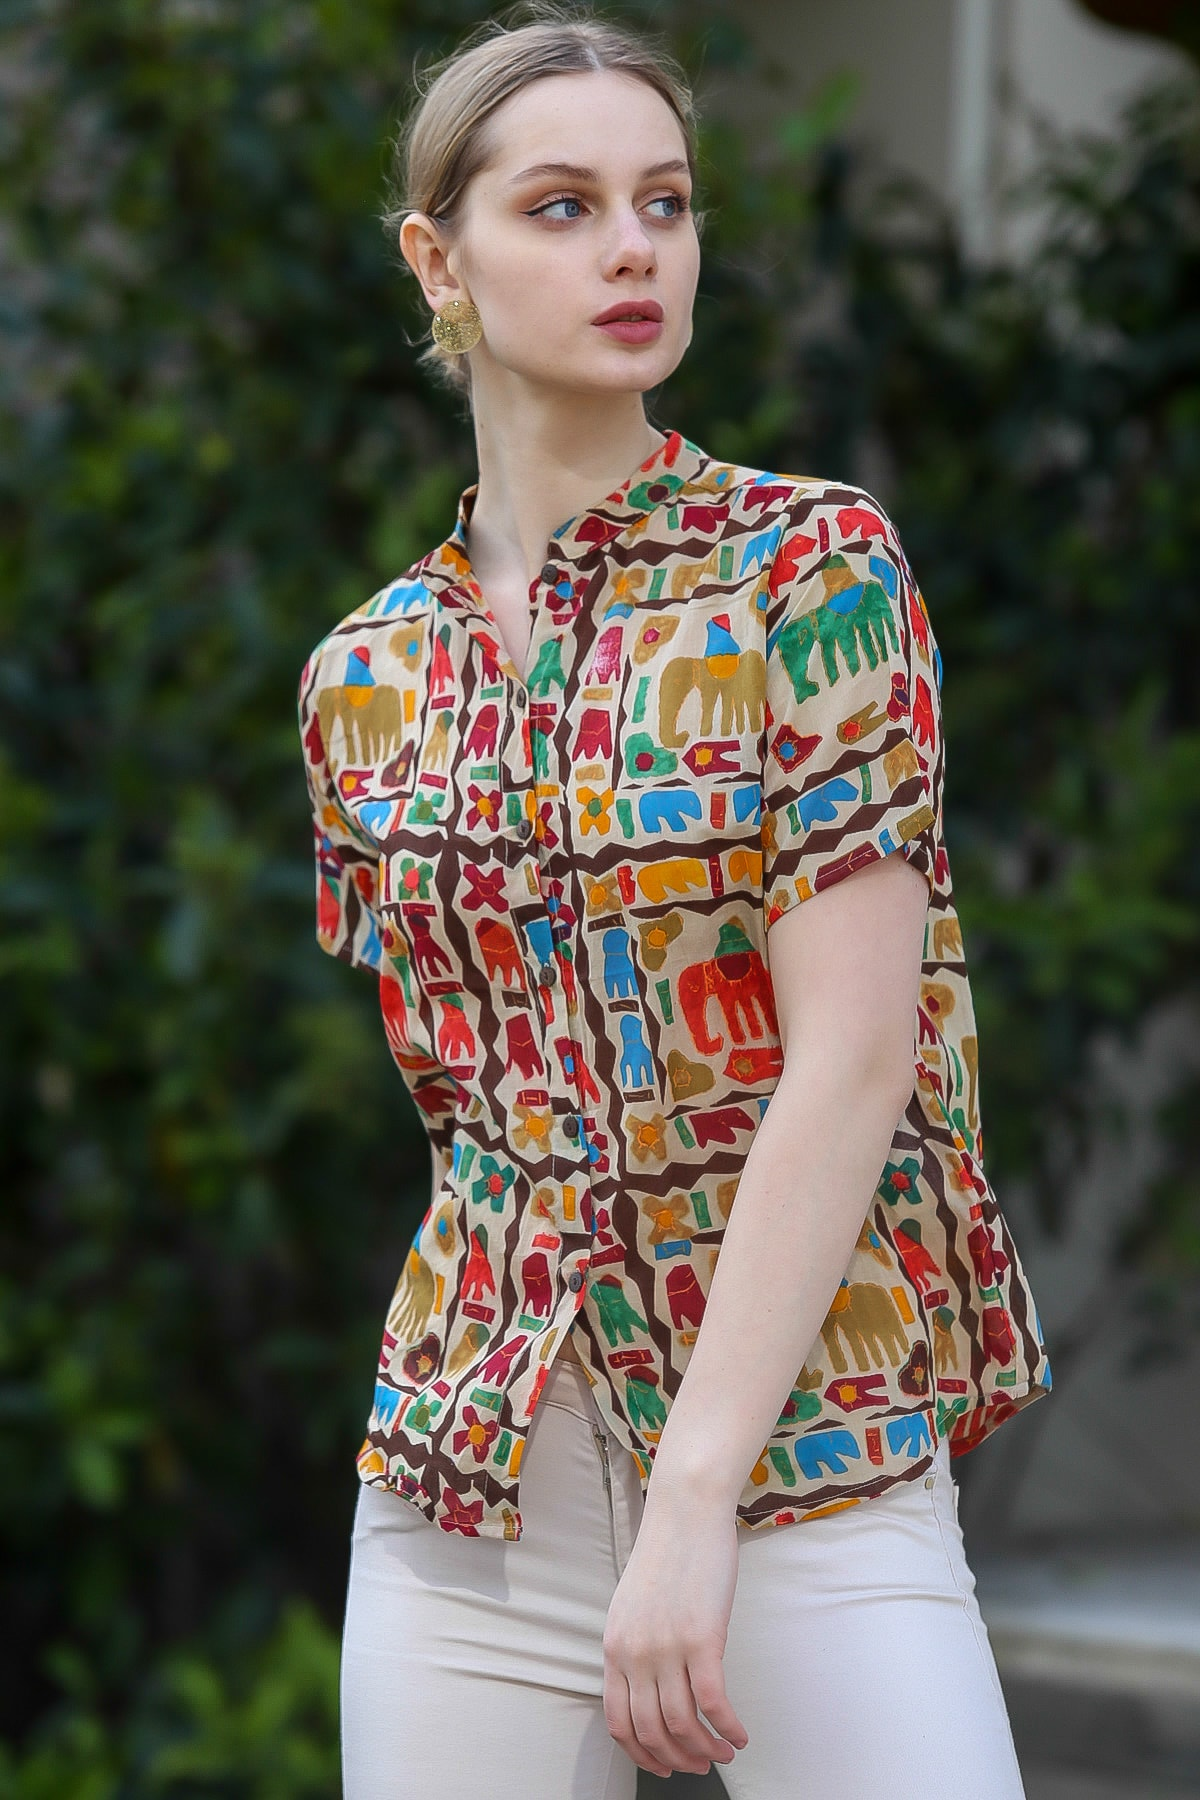 Chiccy Kadın Bej Yakasız Düğme Detaylı Fil Desenli Dokuma Bluz M10010200BL95376 2